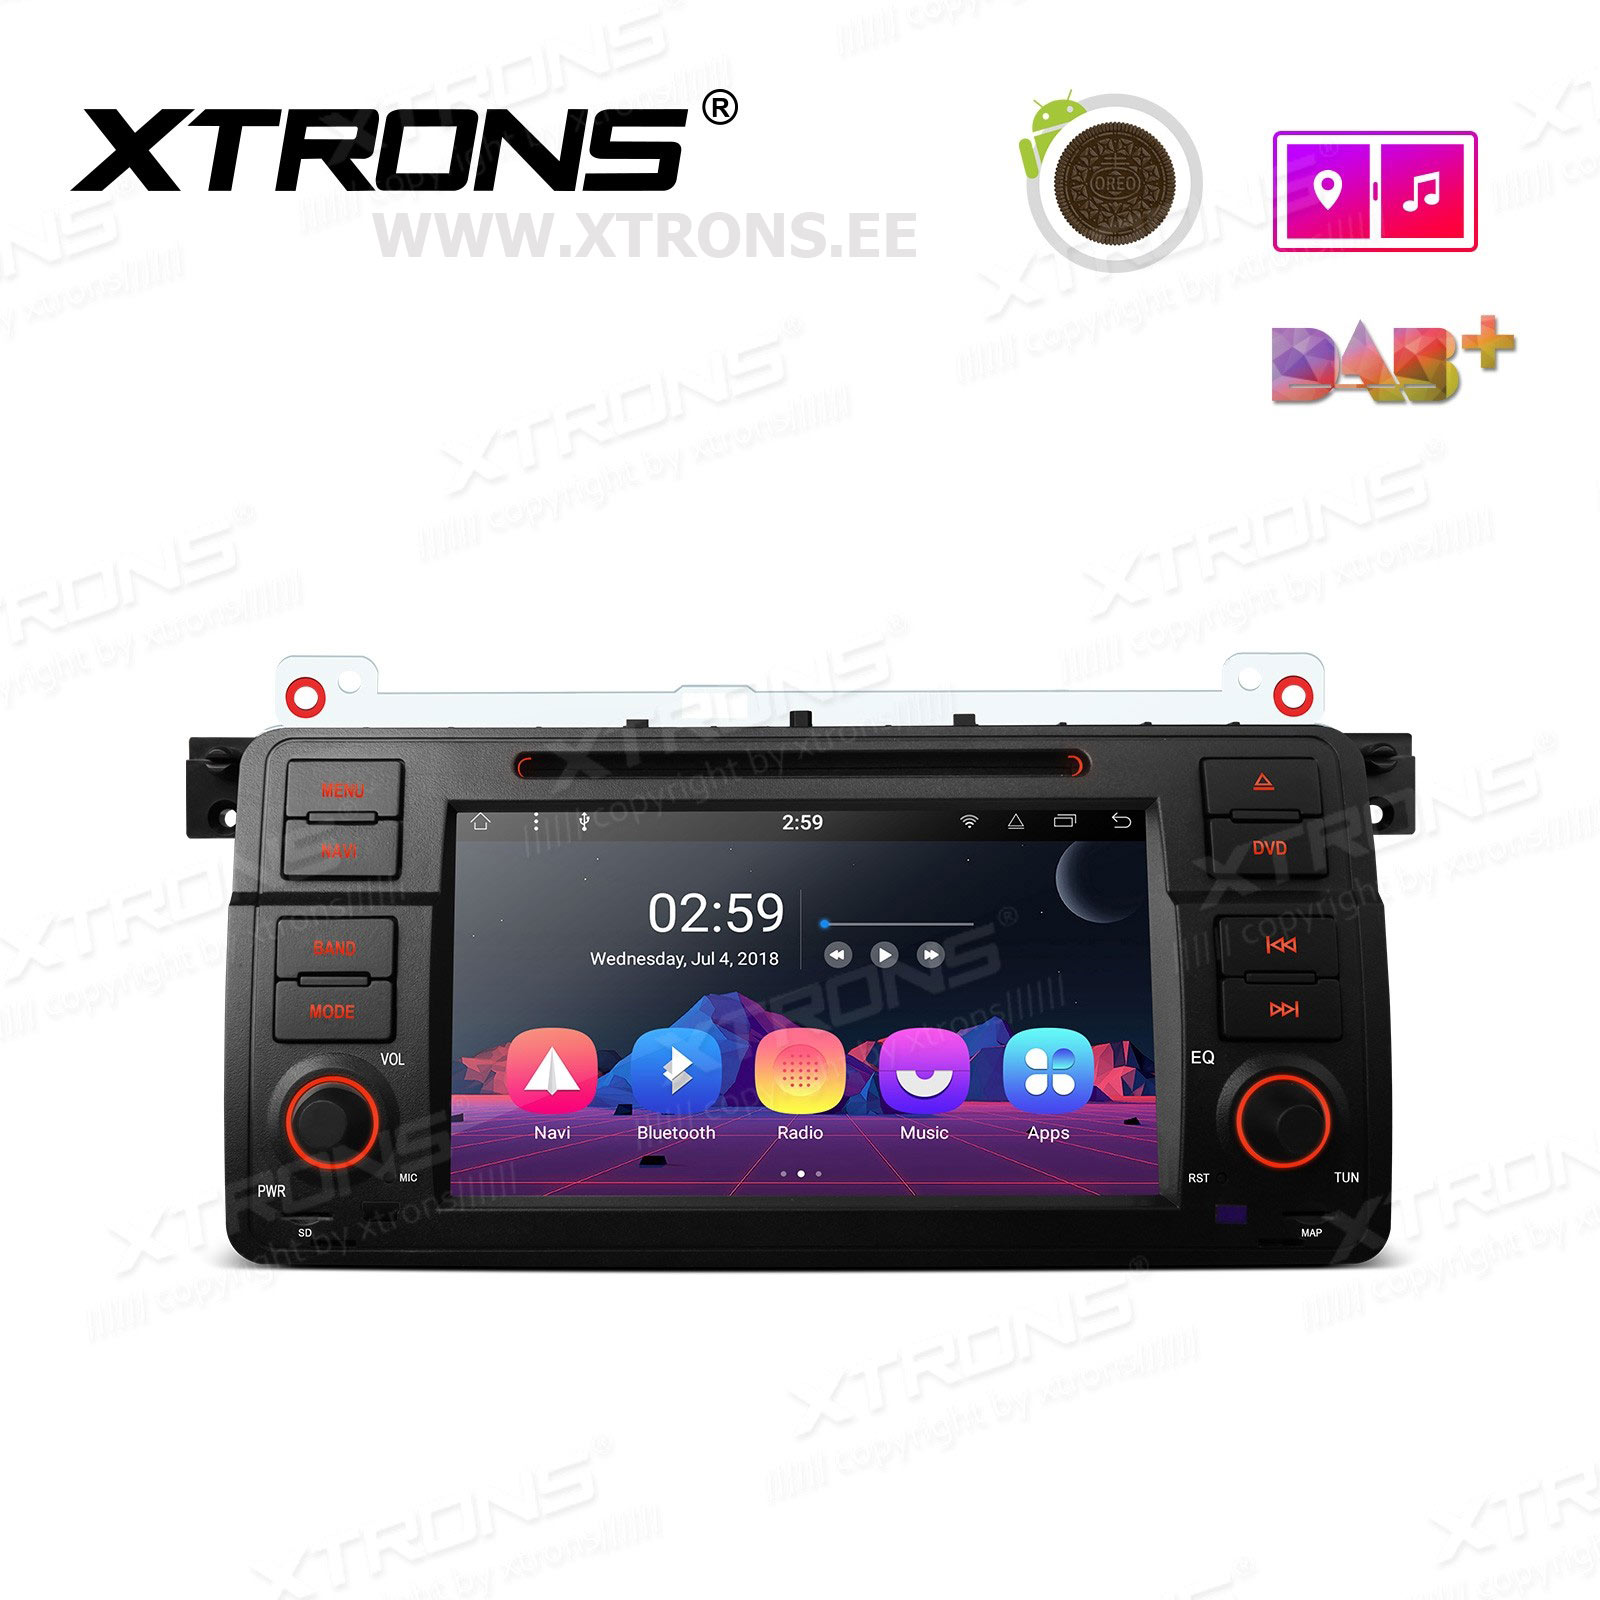 XTRONS PR7846B